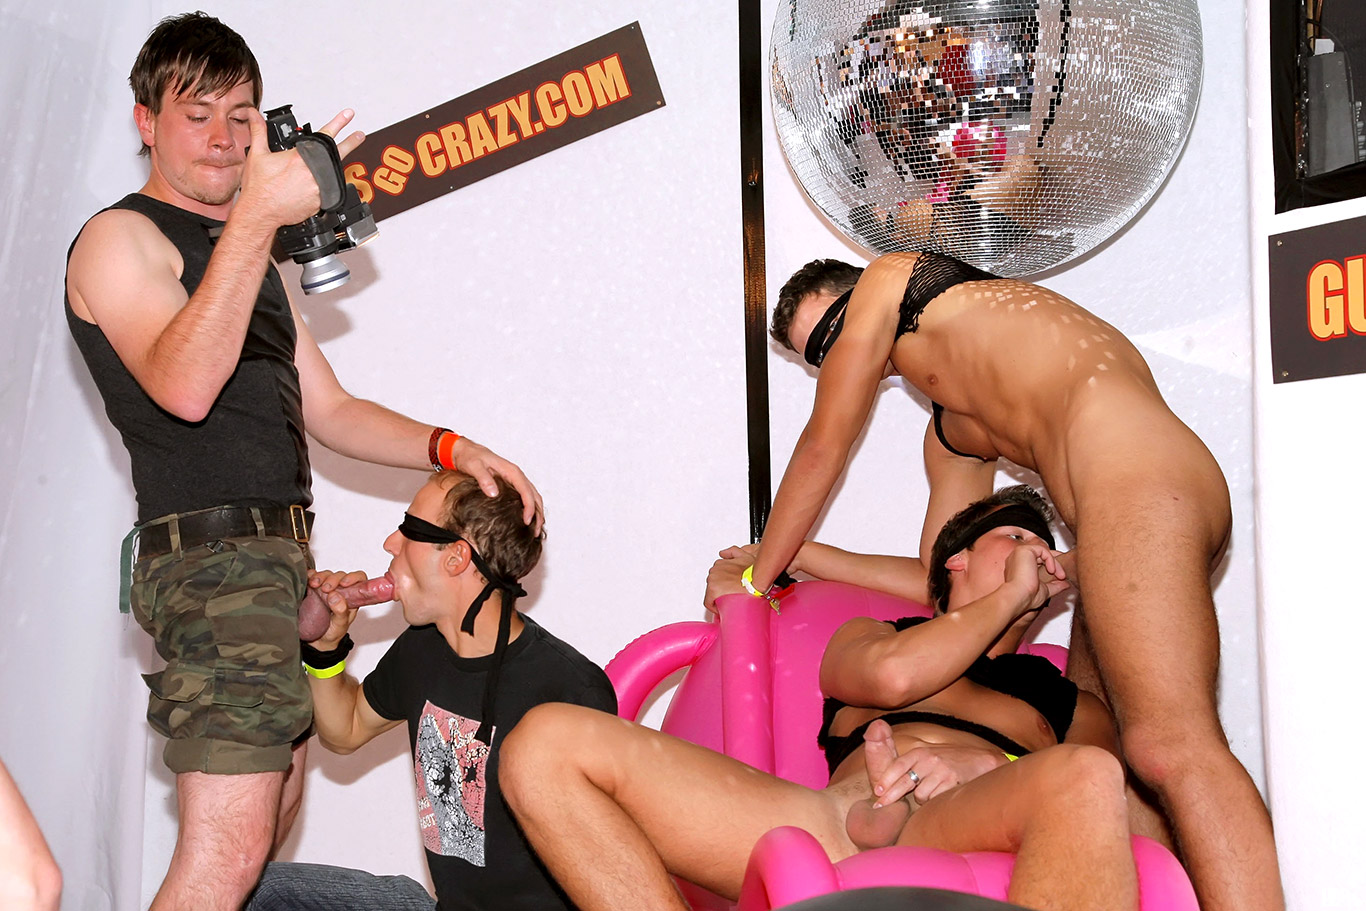 For the craziest orgies, check out guys go crazy